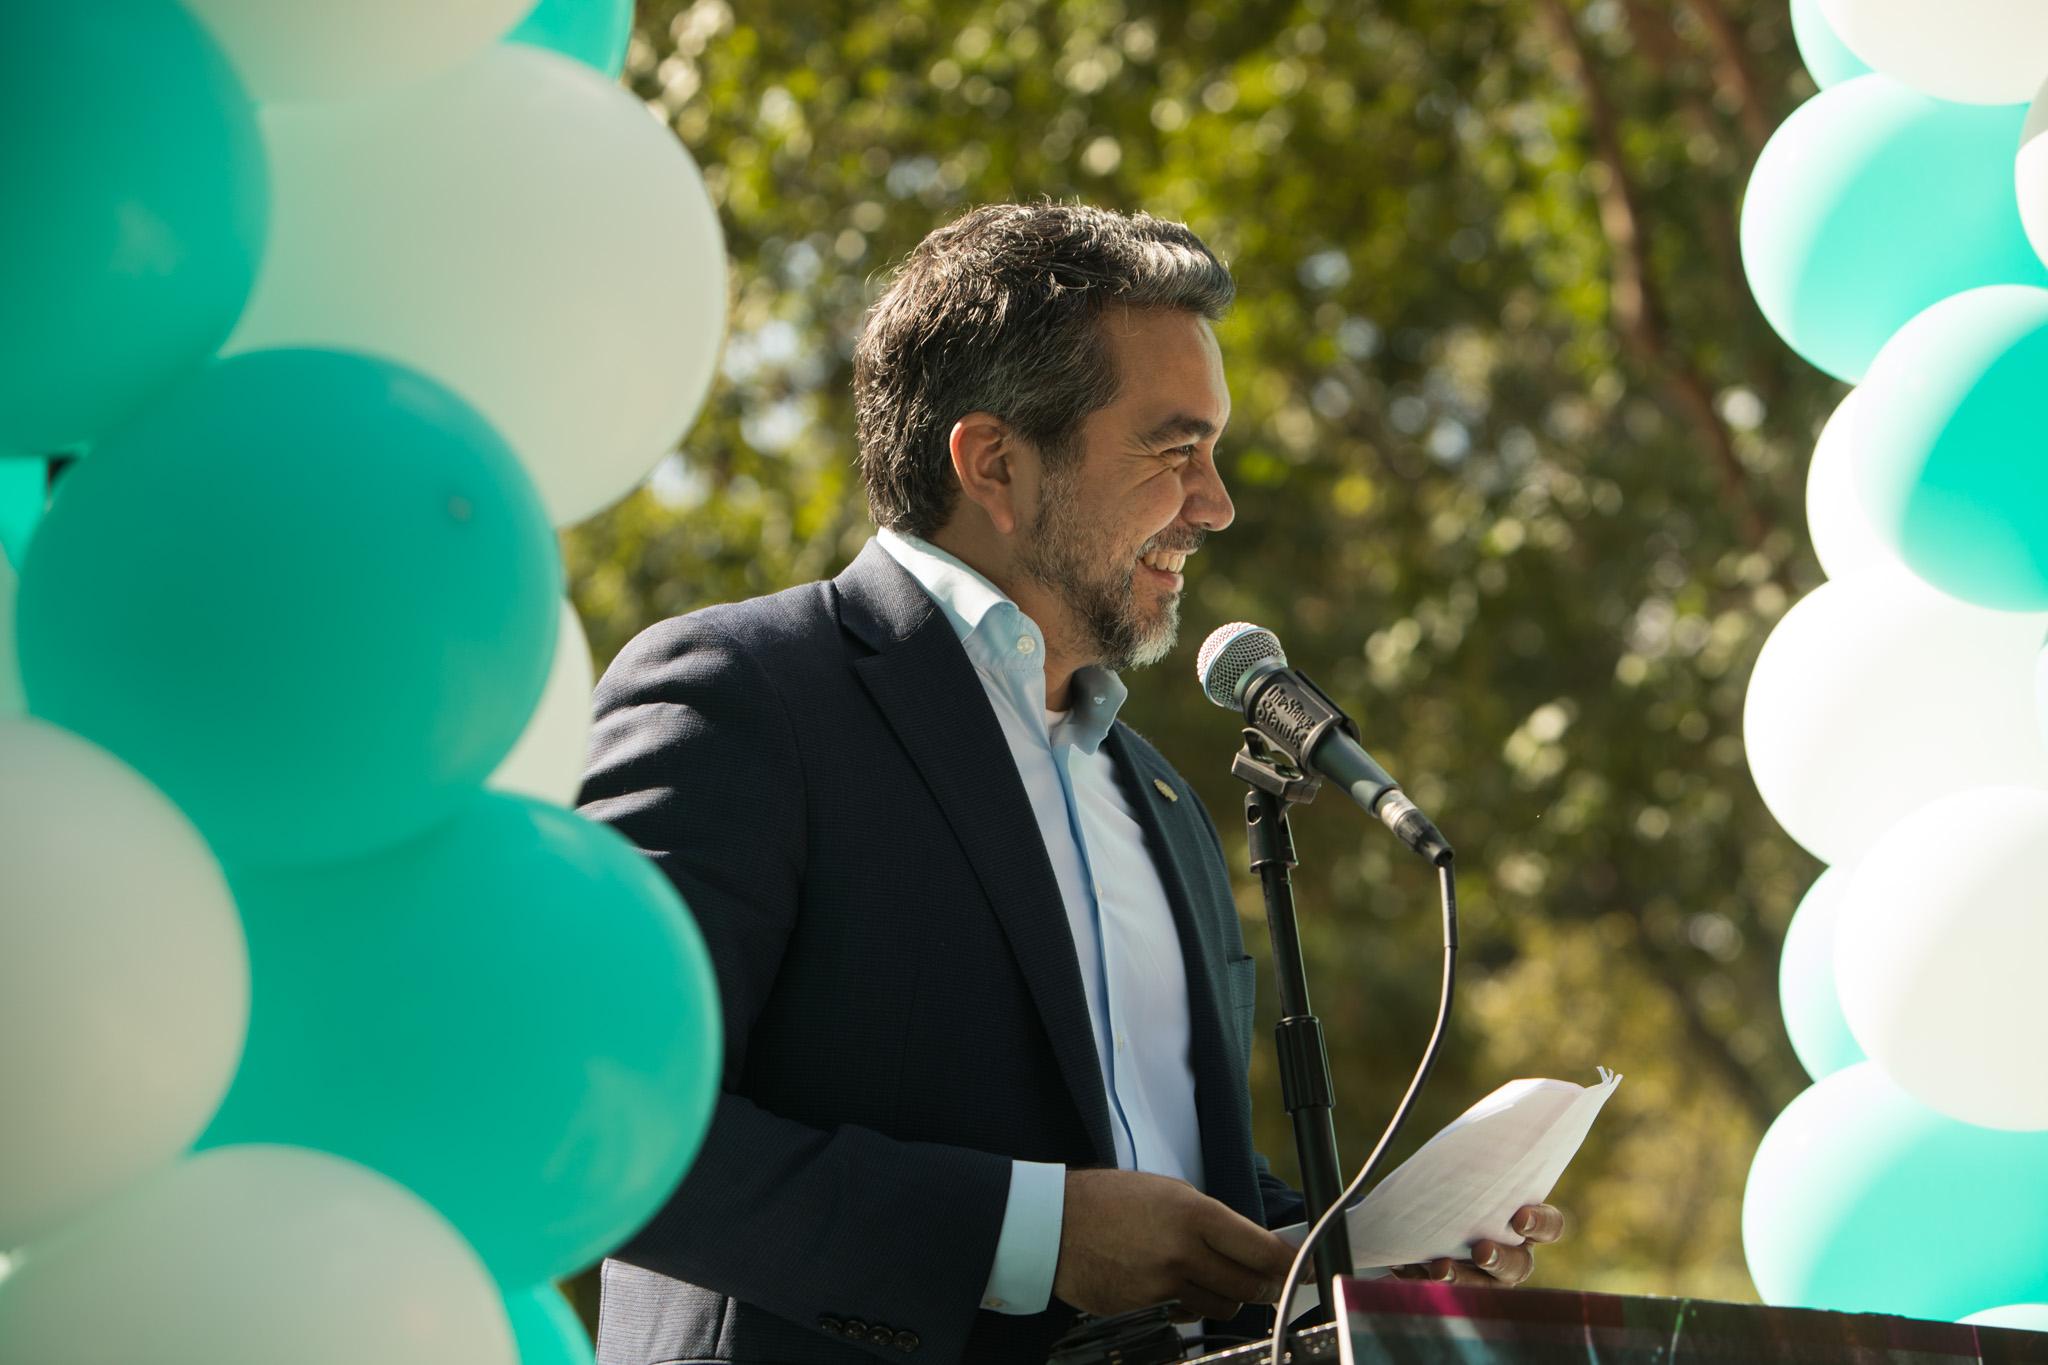 Councilman Roberto Treviño (D1) speaks at the Hemisfair 50th Anniversary Announcement Press Event.